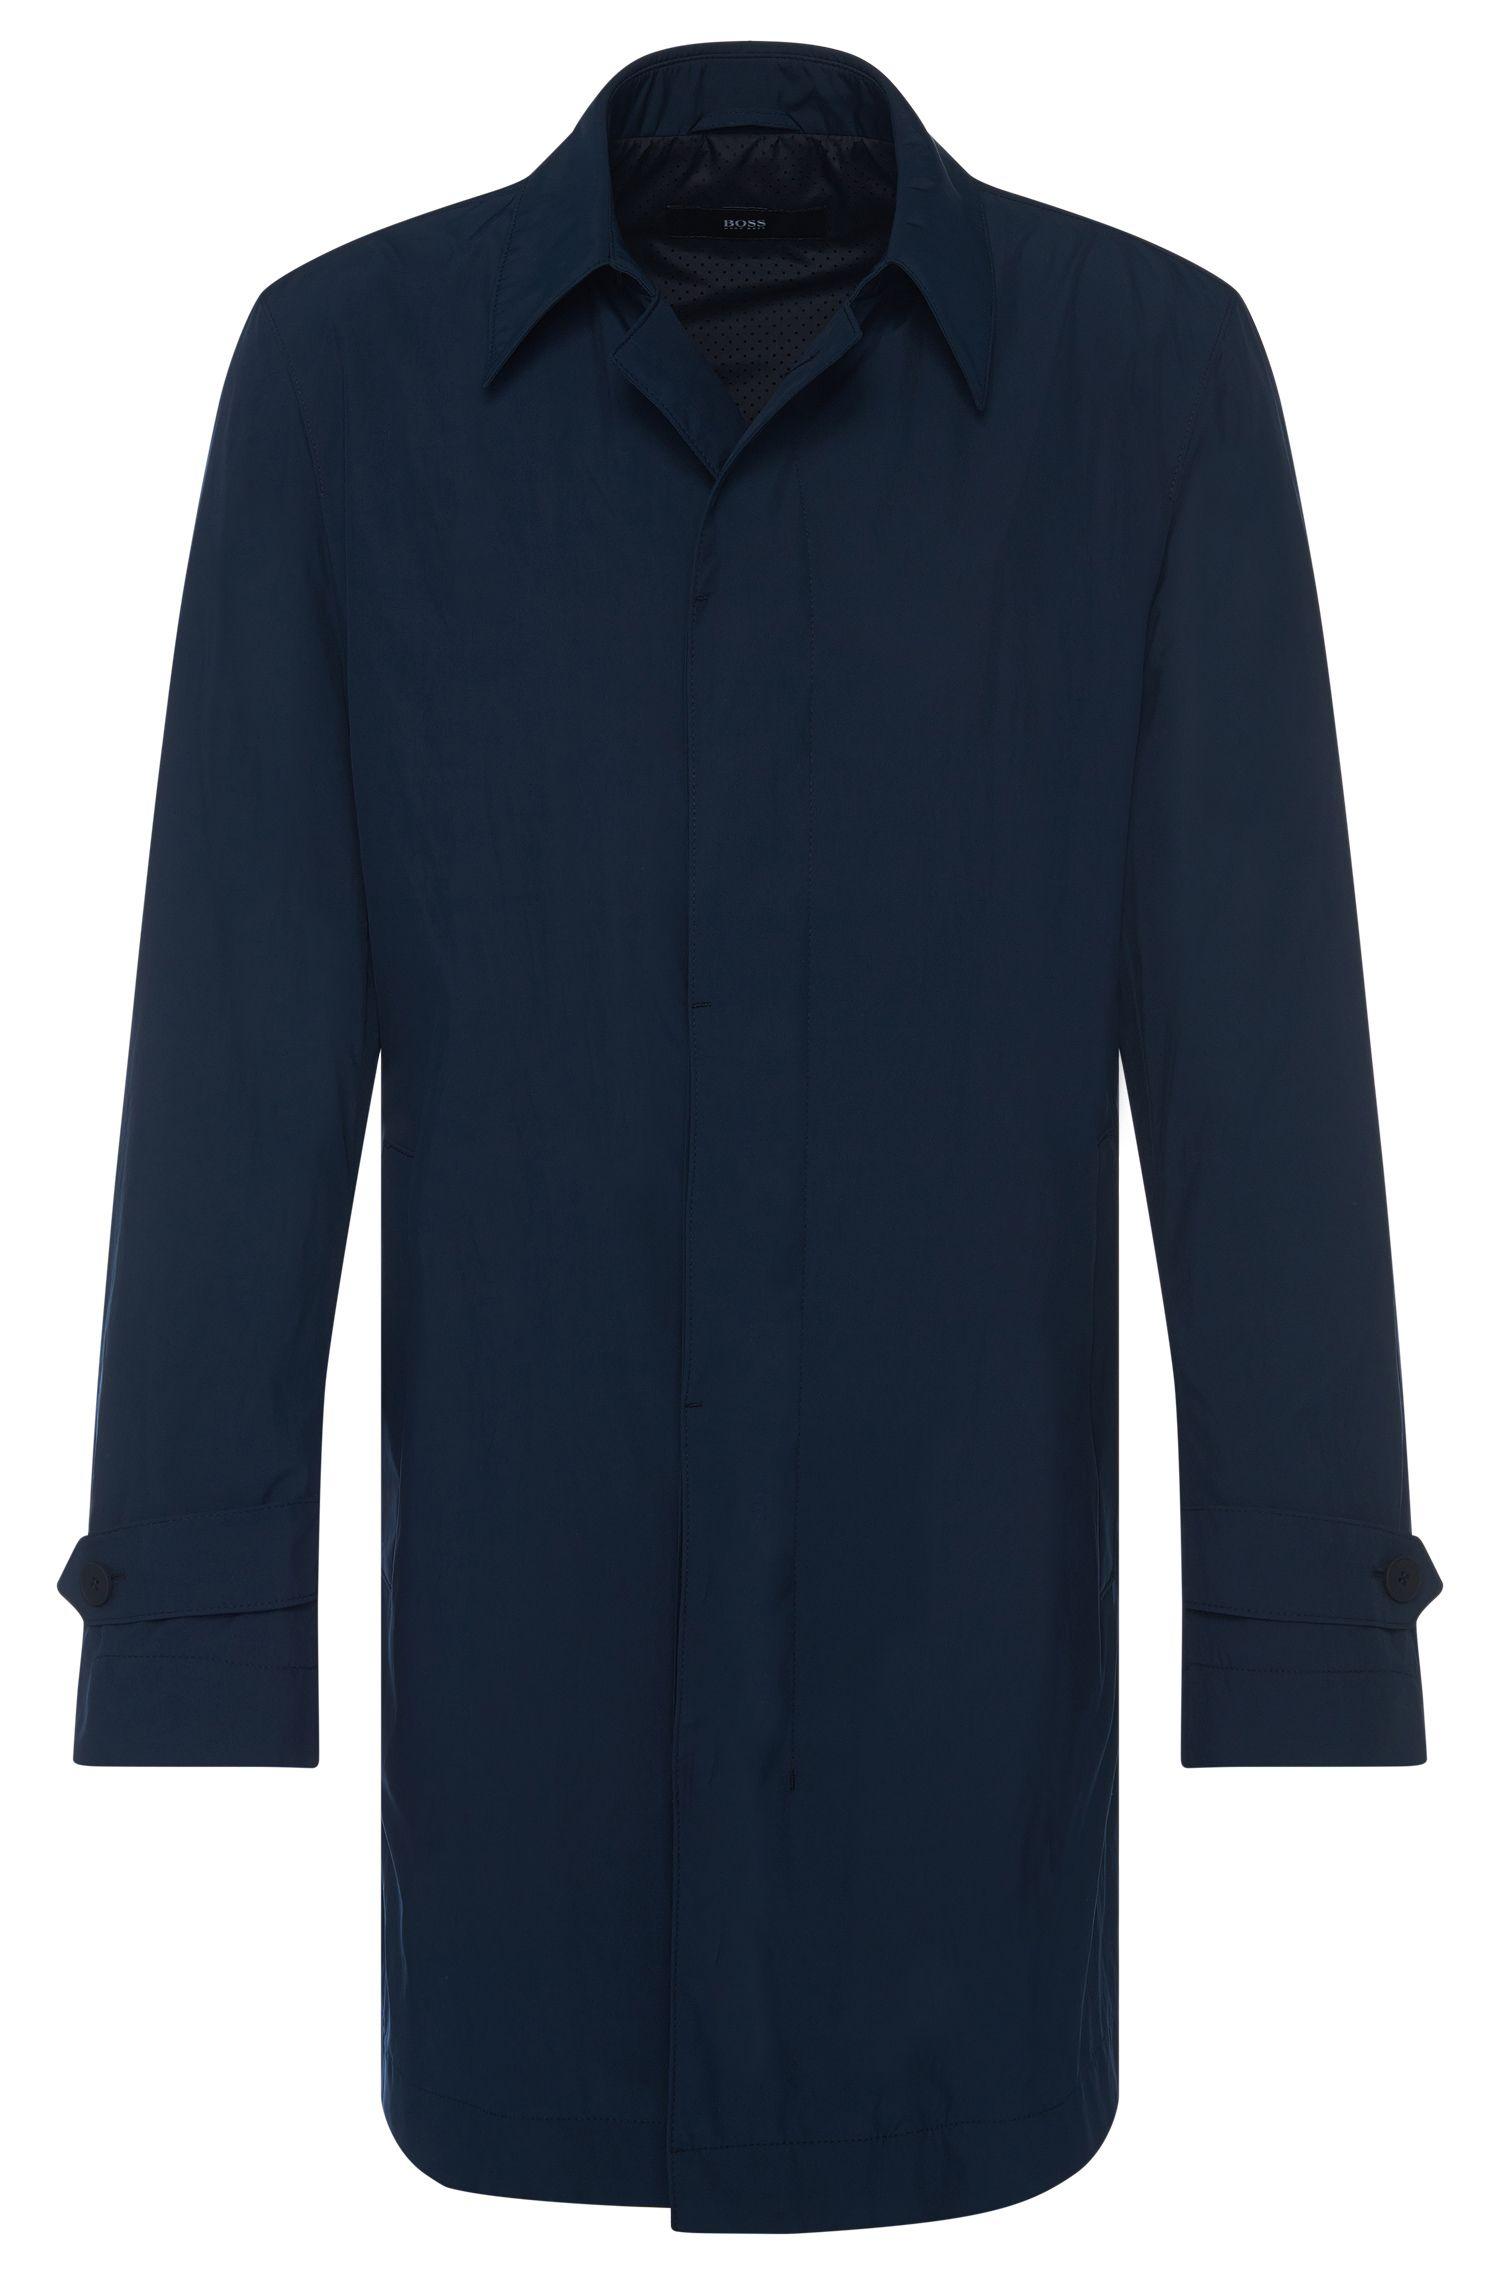 Abrigo impermeable regular fit con tapeta de botones oculta: 'Garret2'